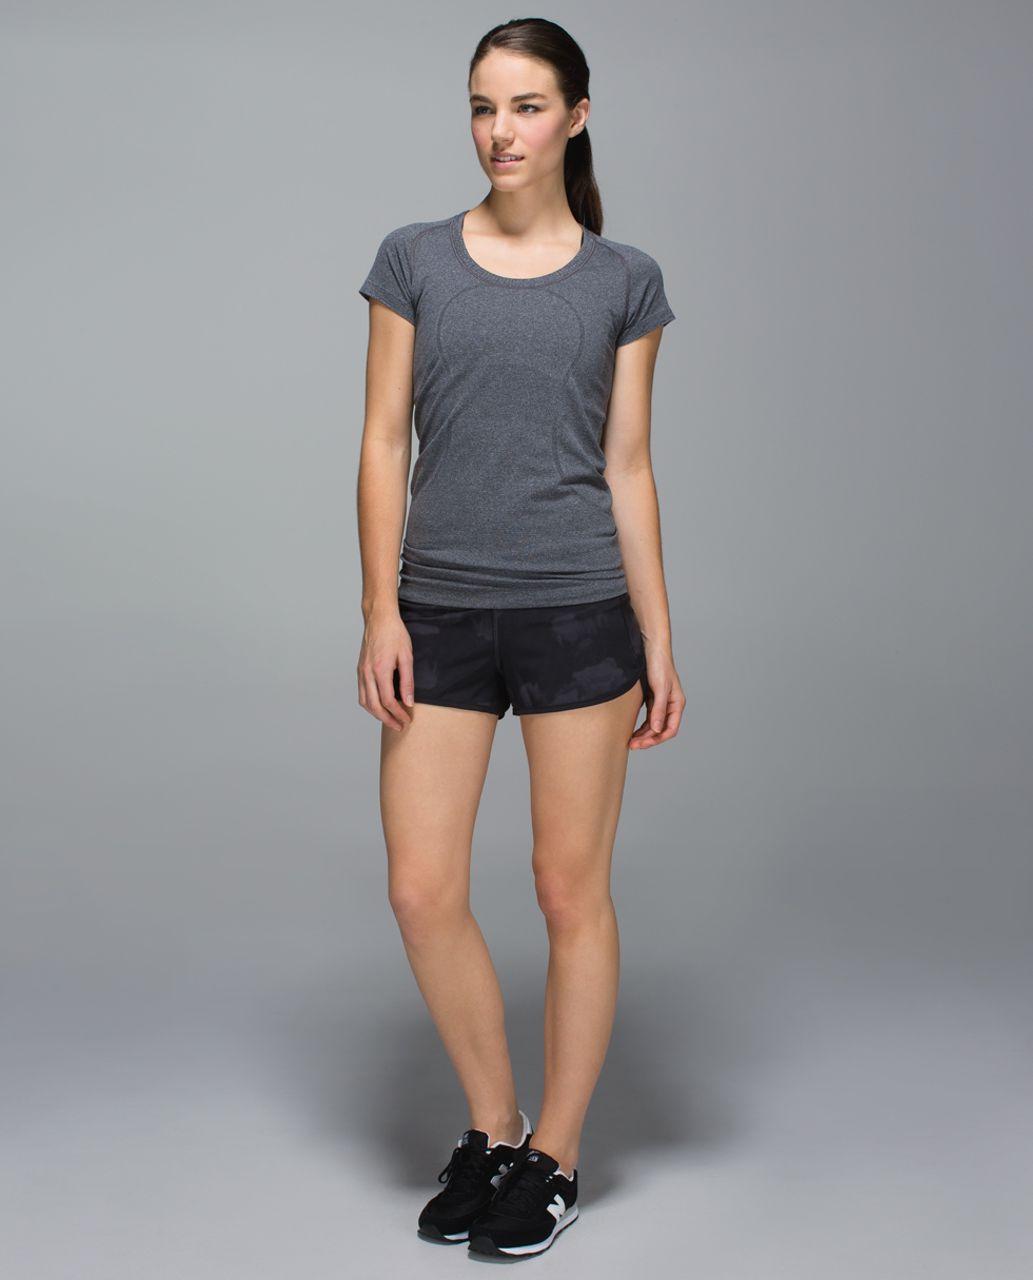 Lululemon Run:  Speed Short *4-way Stretch - Dream Rose Deep Coal Black / Black